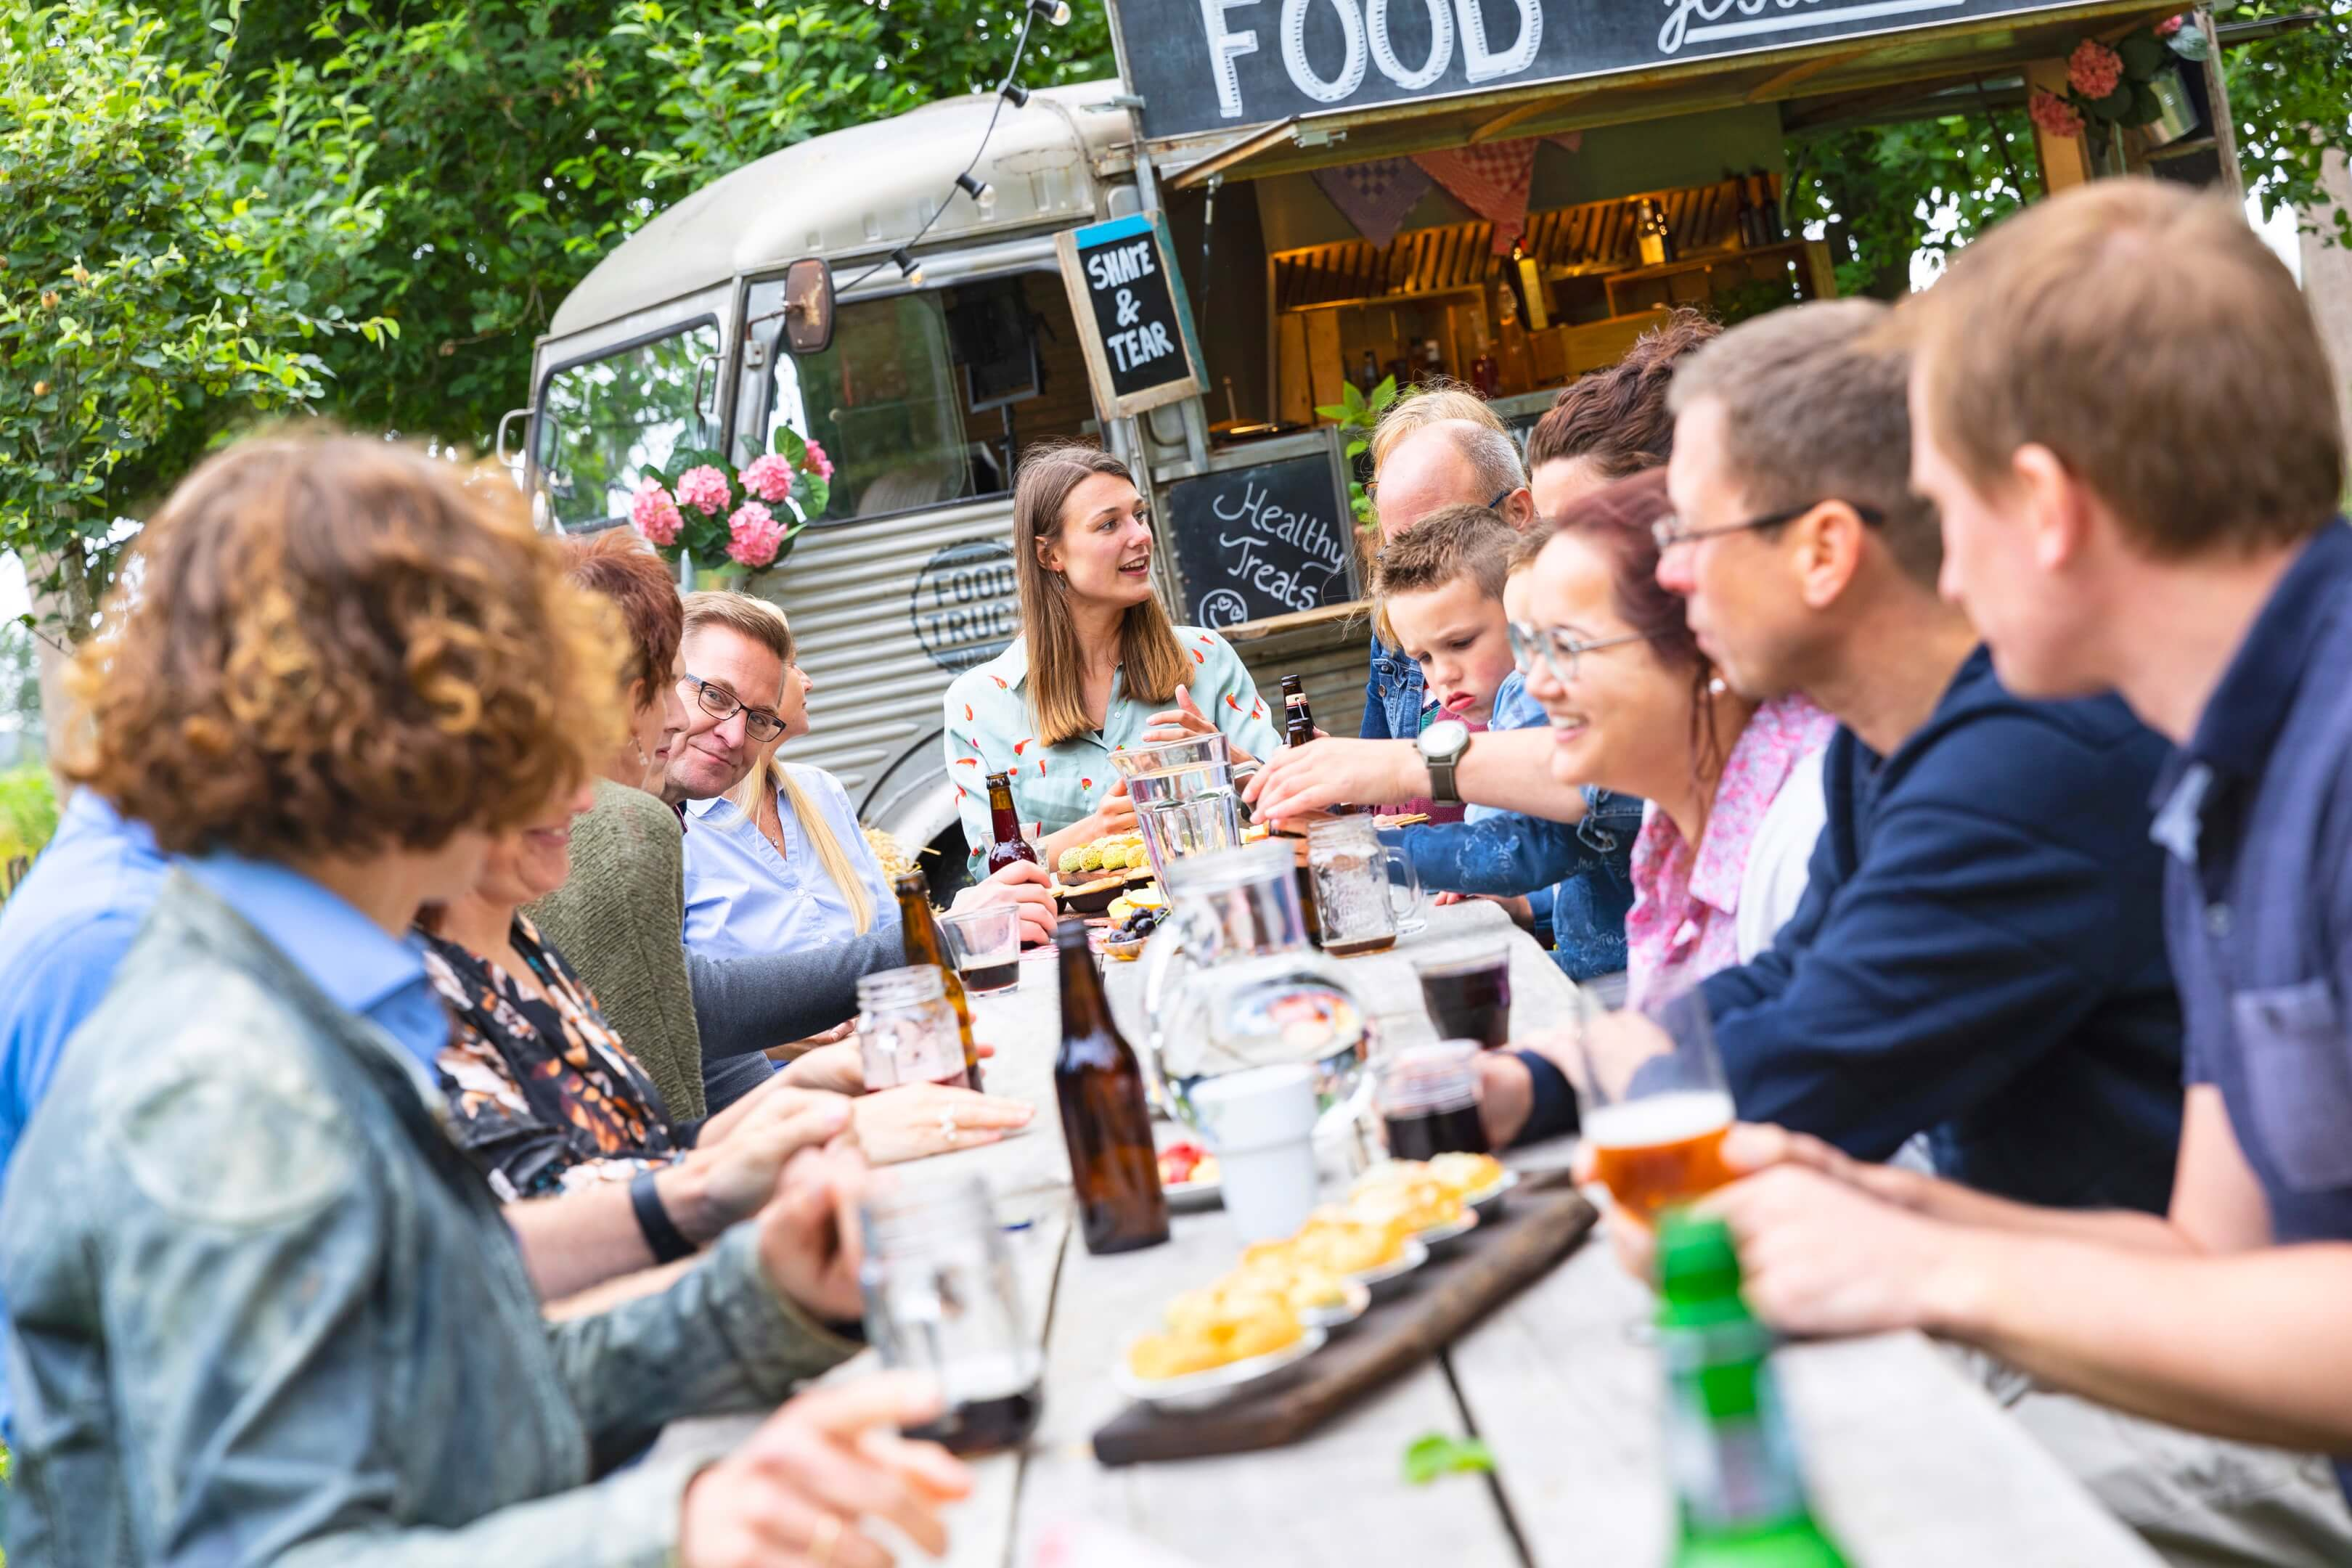 Ruitenberg Ingredients Jurjen Poeles fotografie lifestyle zomerse spraakmakers spraakmaker foodfotografie foodtruck foodfestival zomer gezelligheid innovatieve foodconcepten